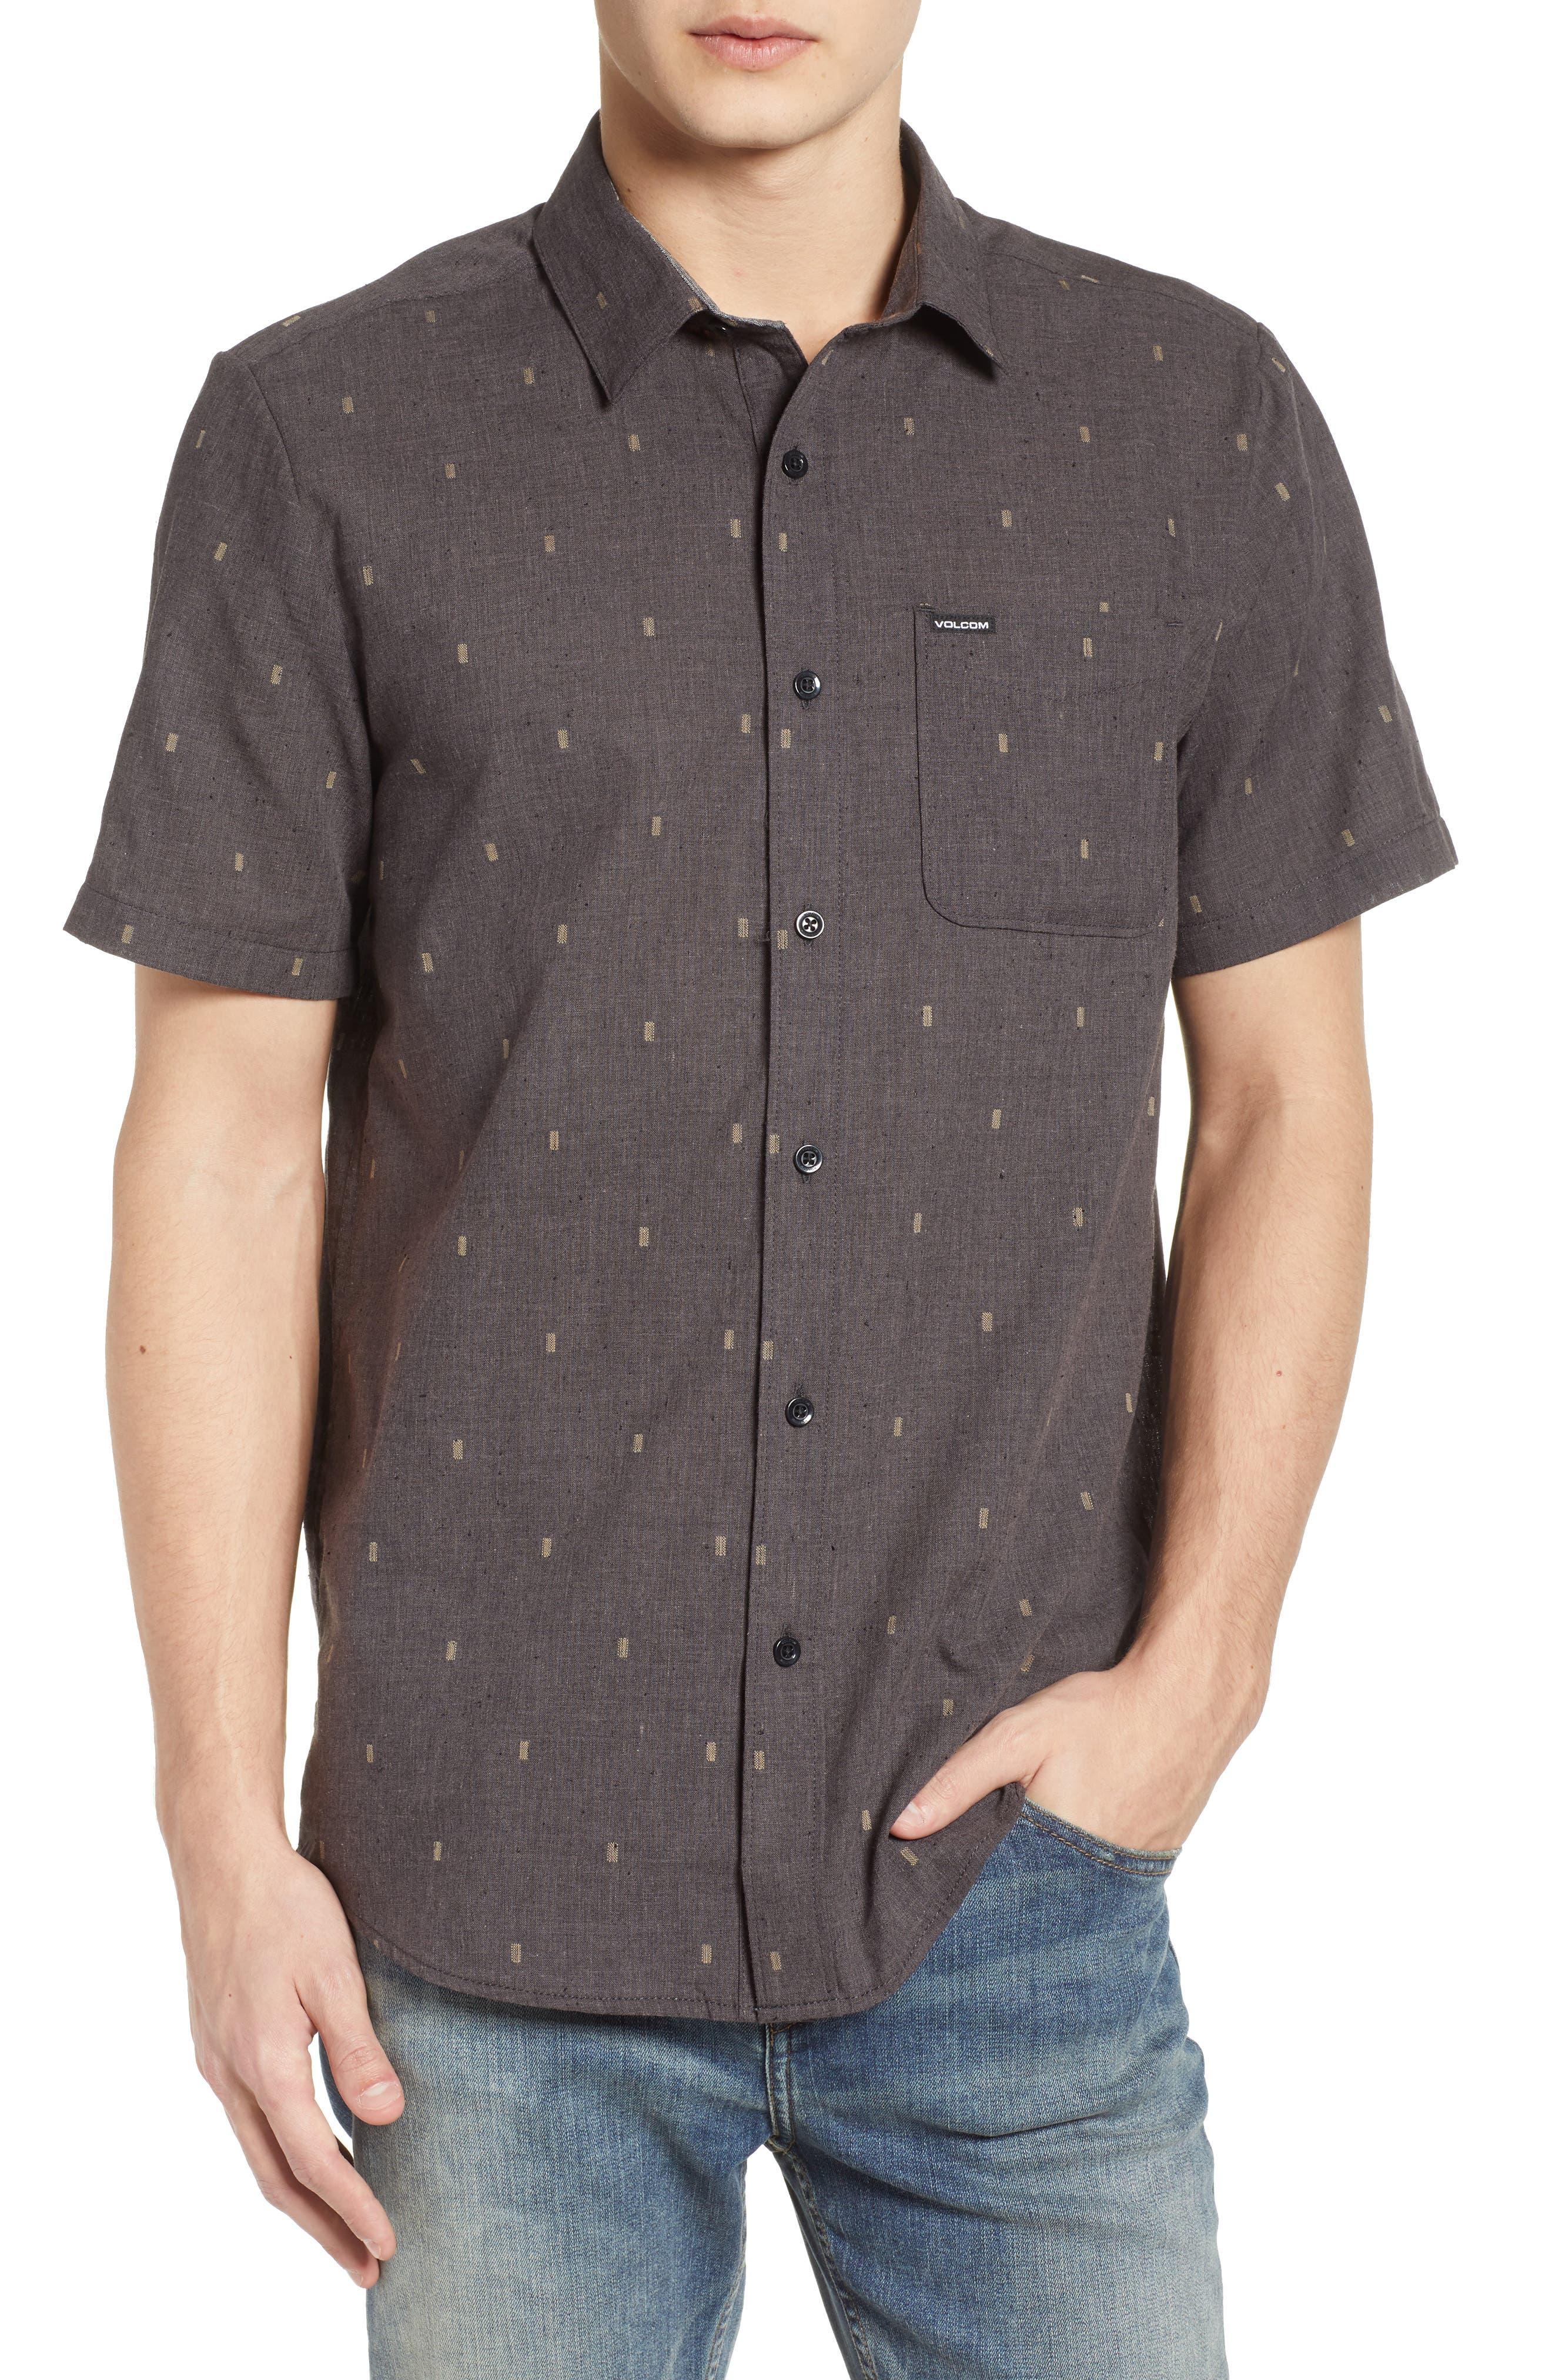 Gladstone Short Sleeve Shirt,                             Main thumbnail 1, color,                             001